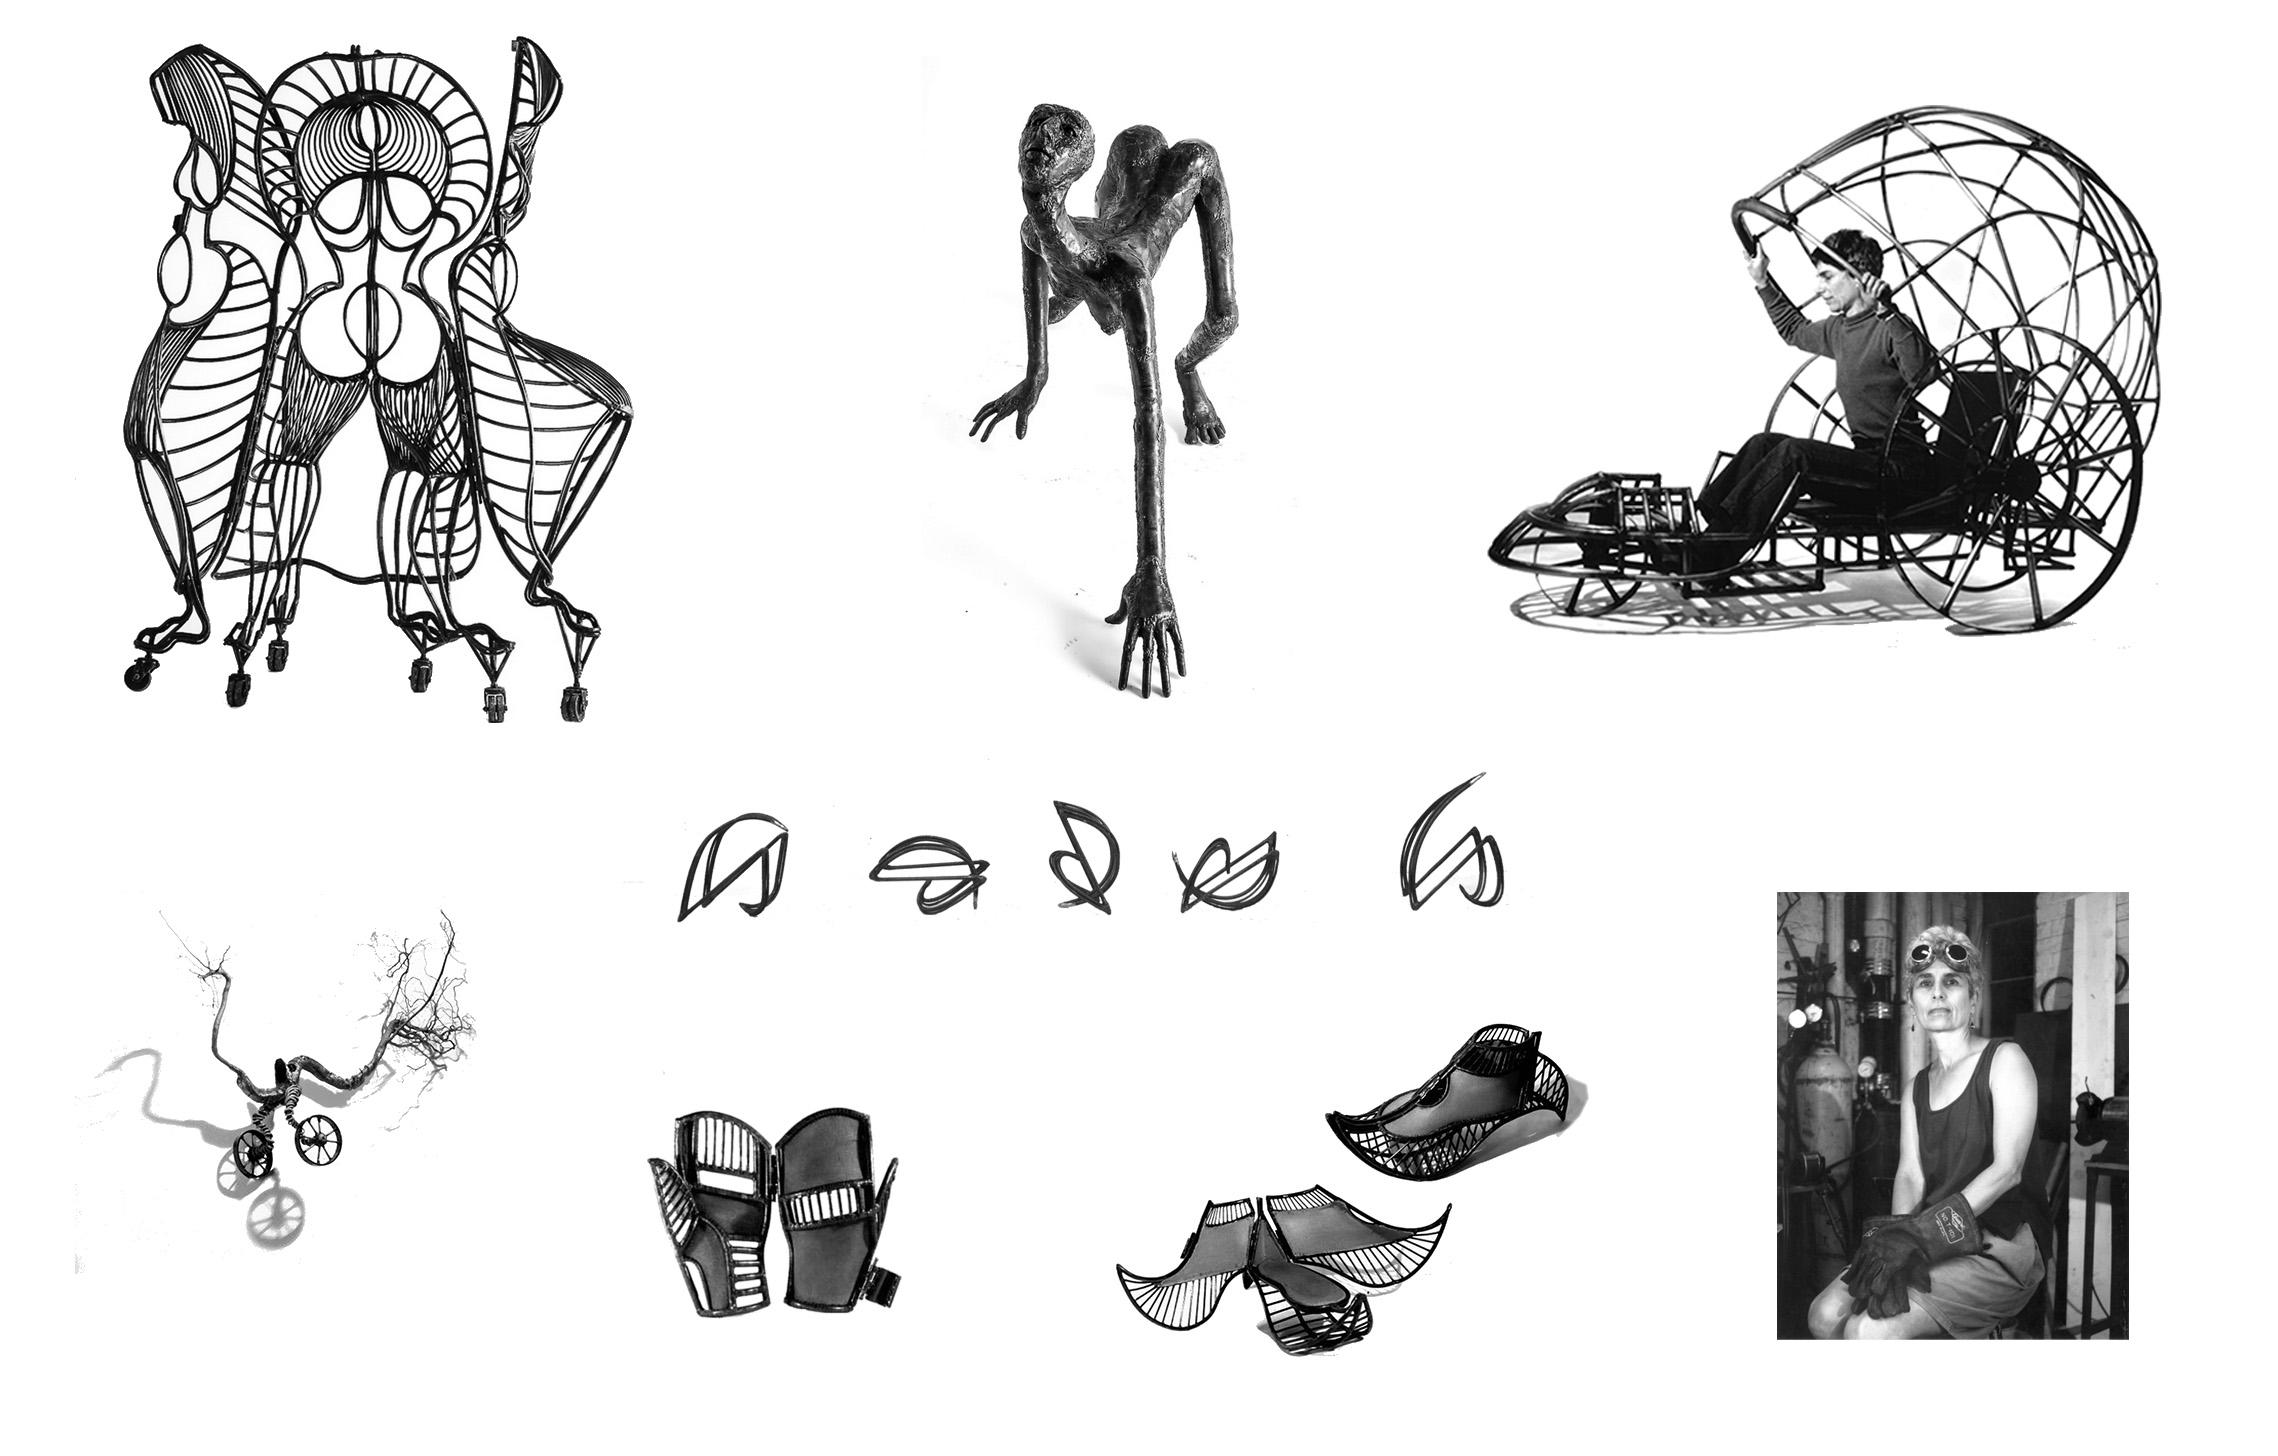 Web Collage 5-17-14.jpg